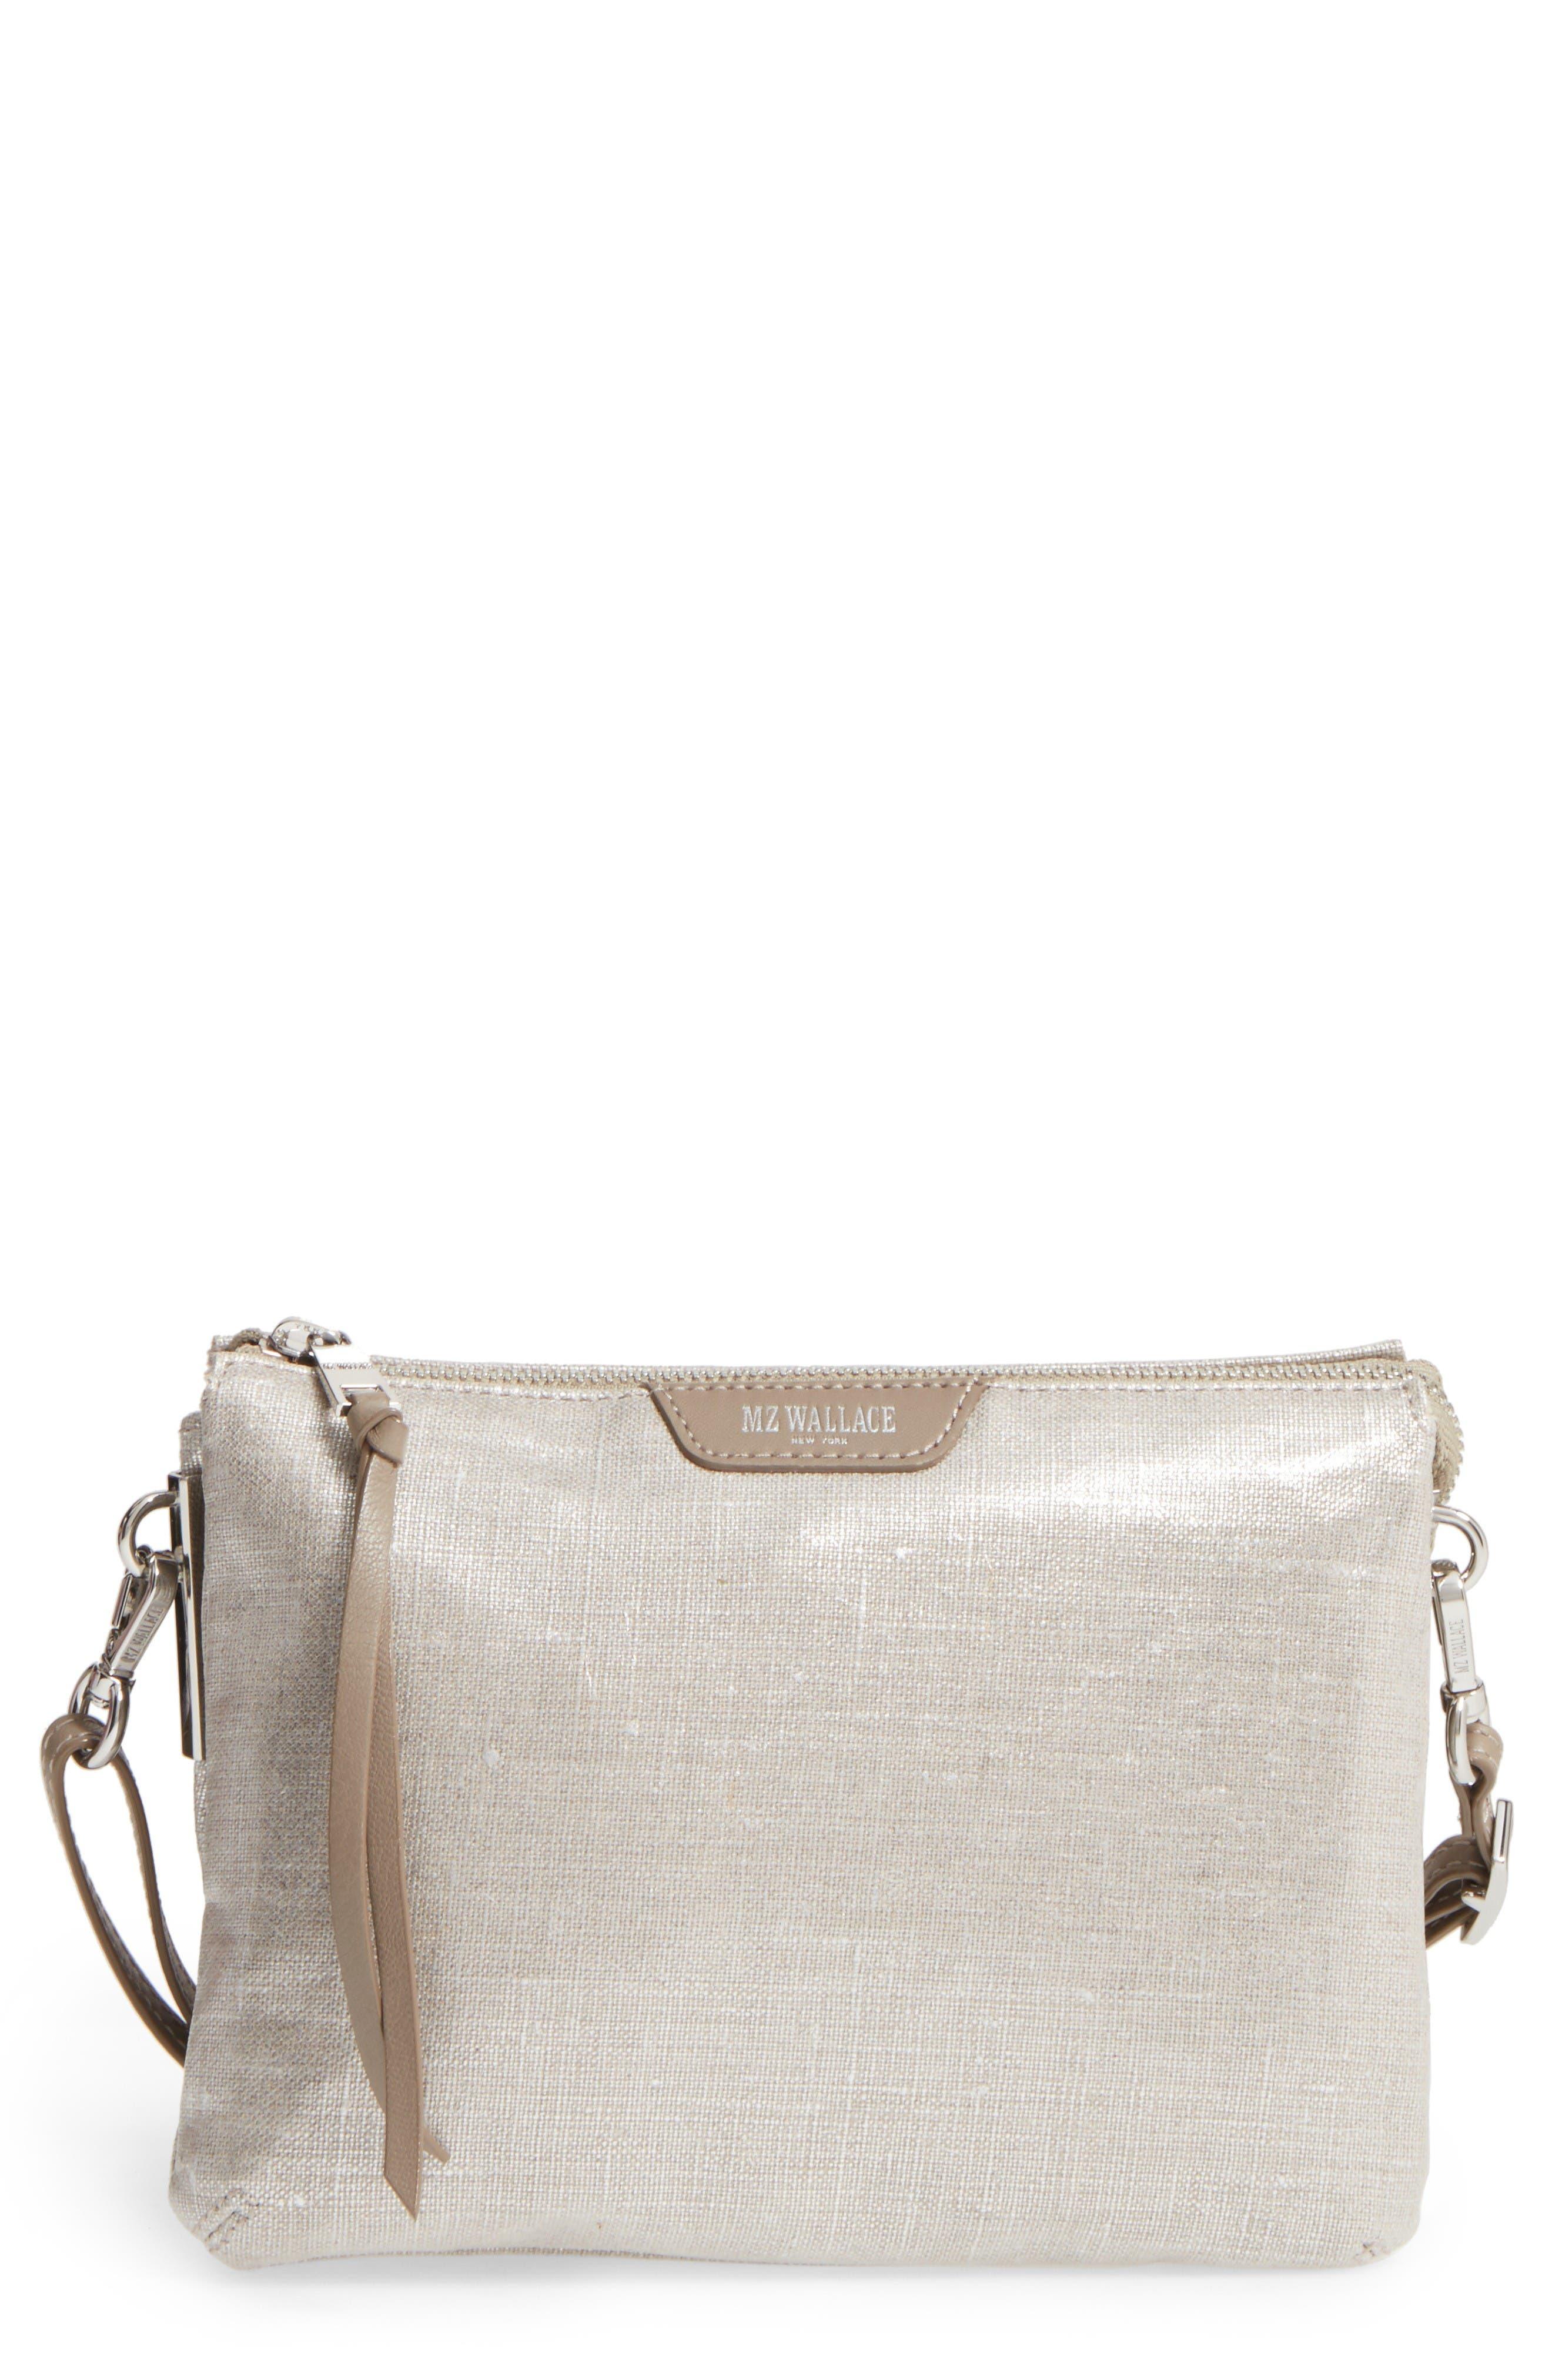 Alternate Image 1 Selected - MZ Wallace 'Pippa' Bedford Nylon Crossbody Bag